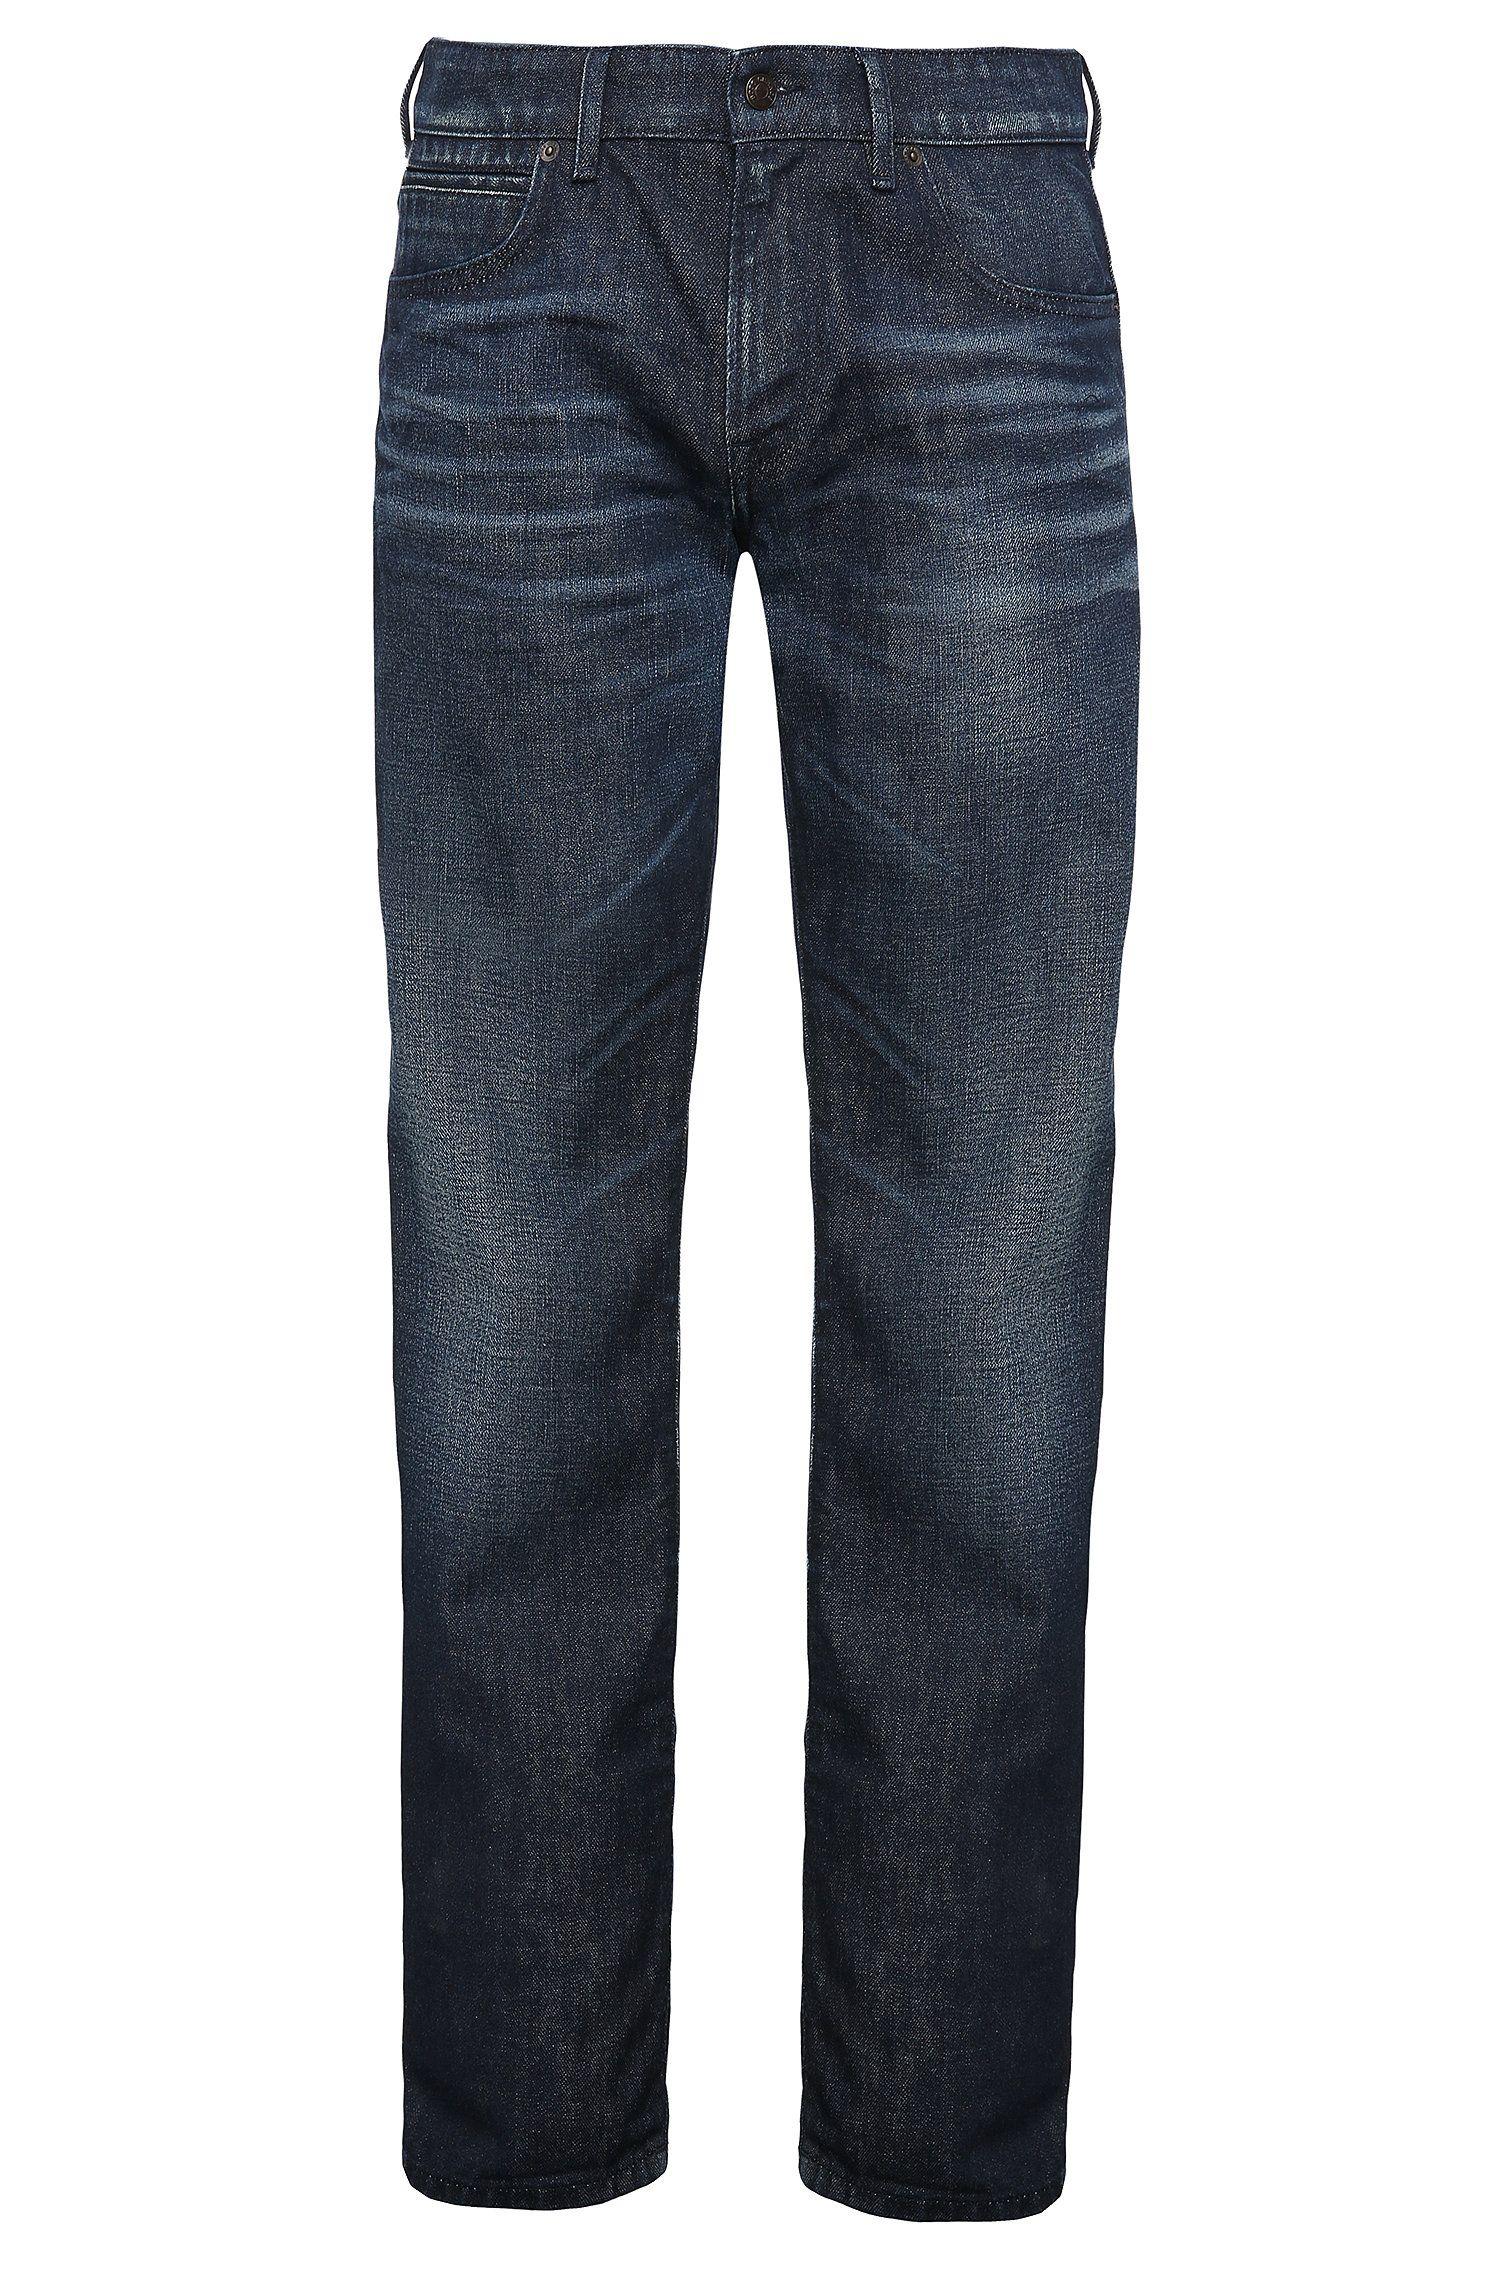 Jeans Regular Fit en pur coton: «Orange24 Barcelona»